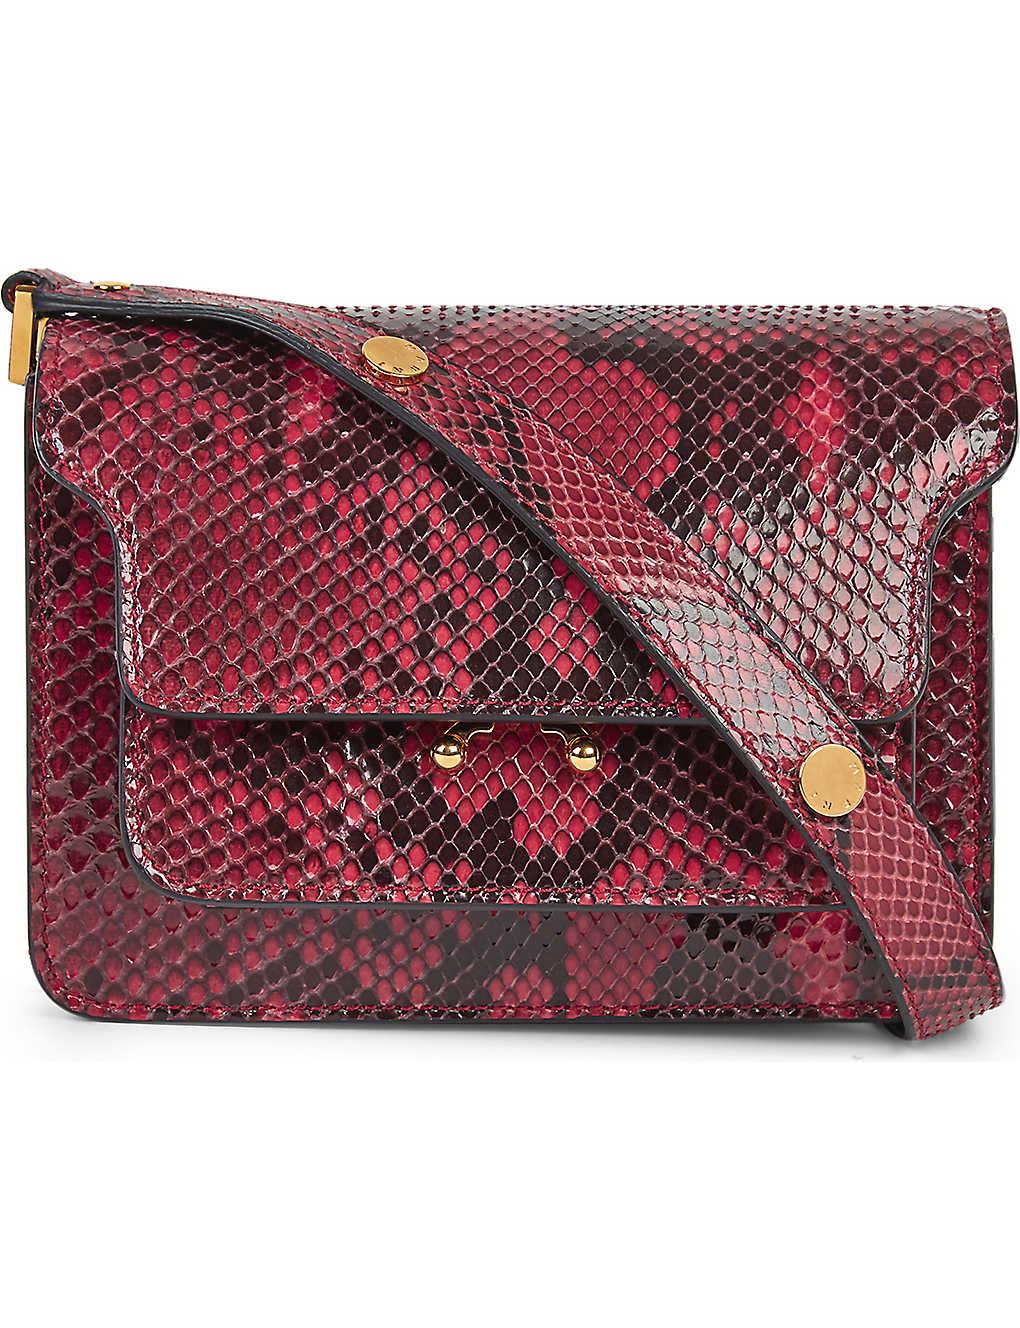 54f885cc44 MARNI - Mini Trunk python-leather shoulder bag